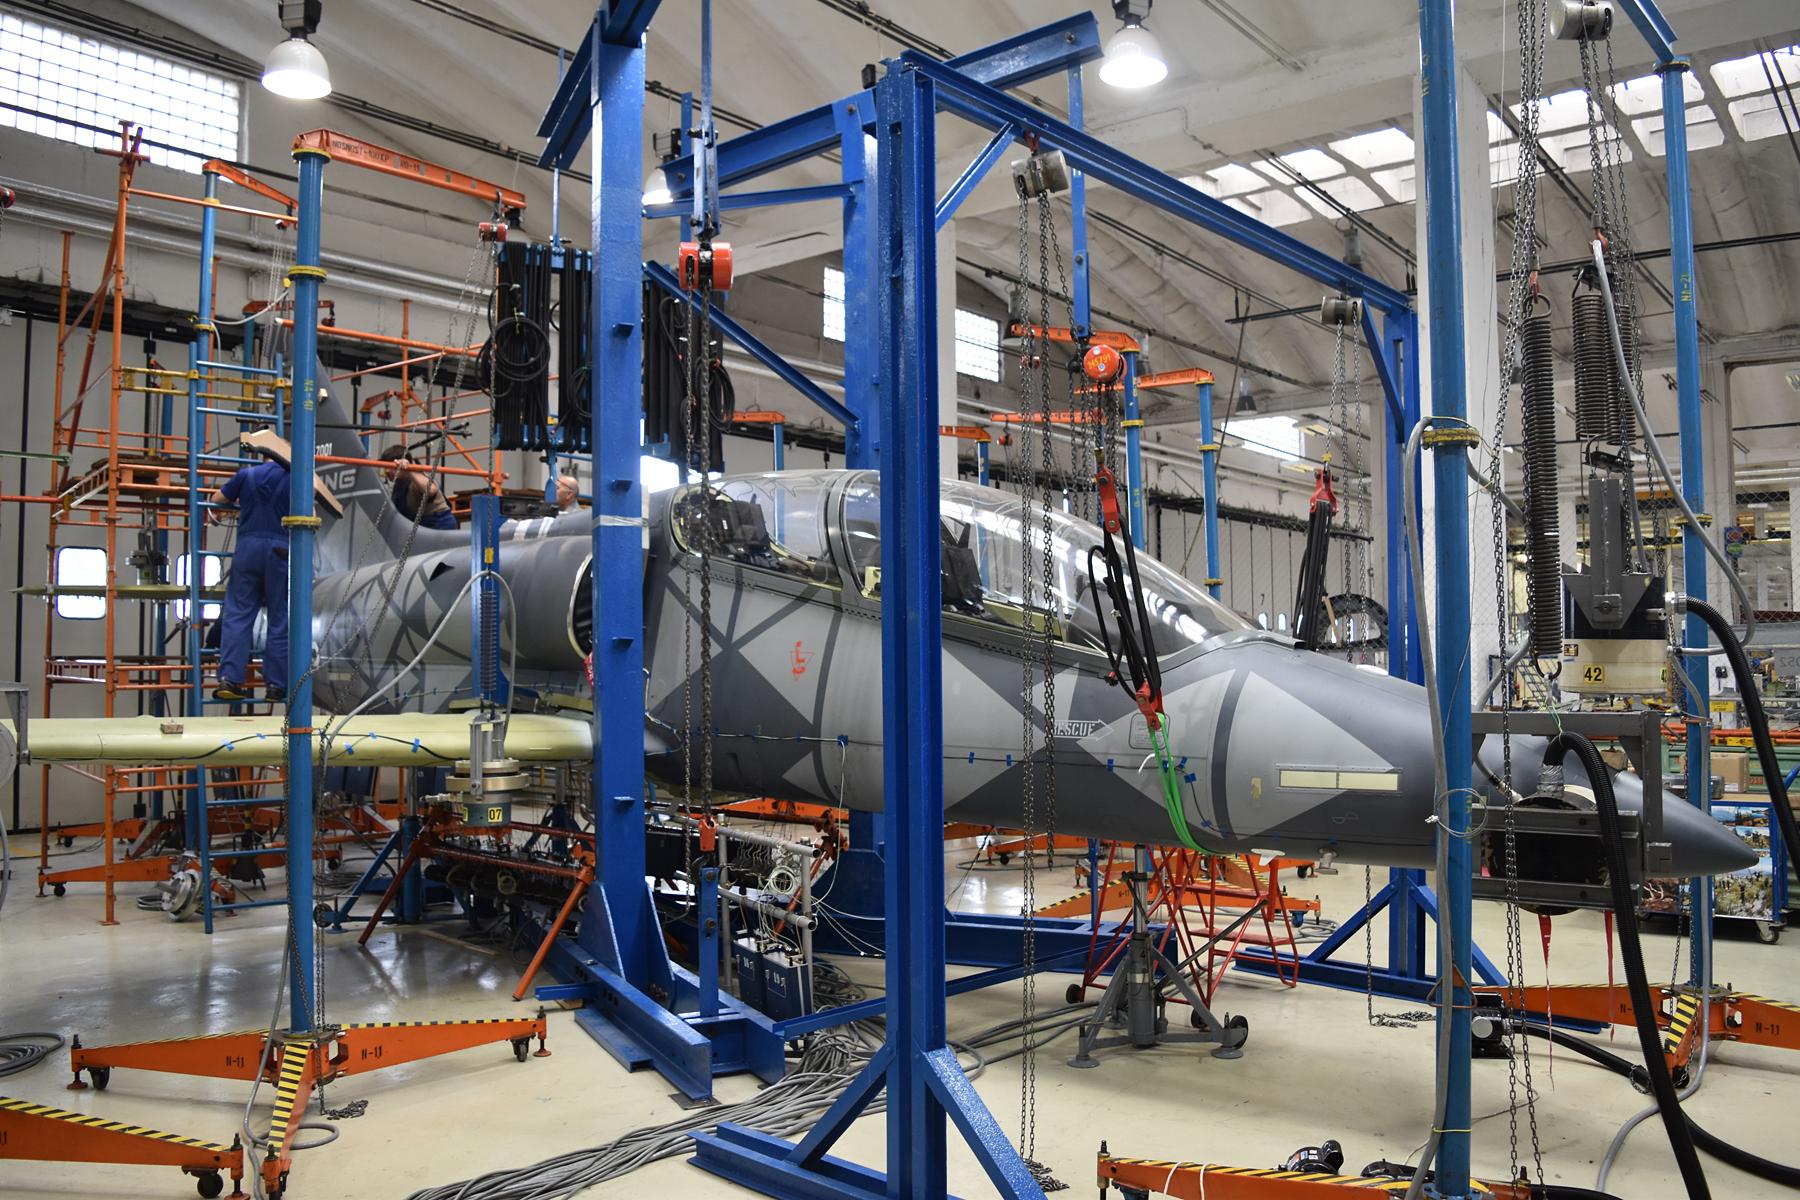 Aero: Next generation plane will help change air force pilot